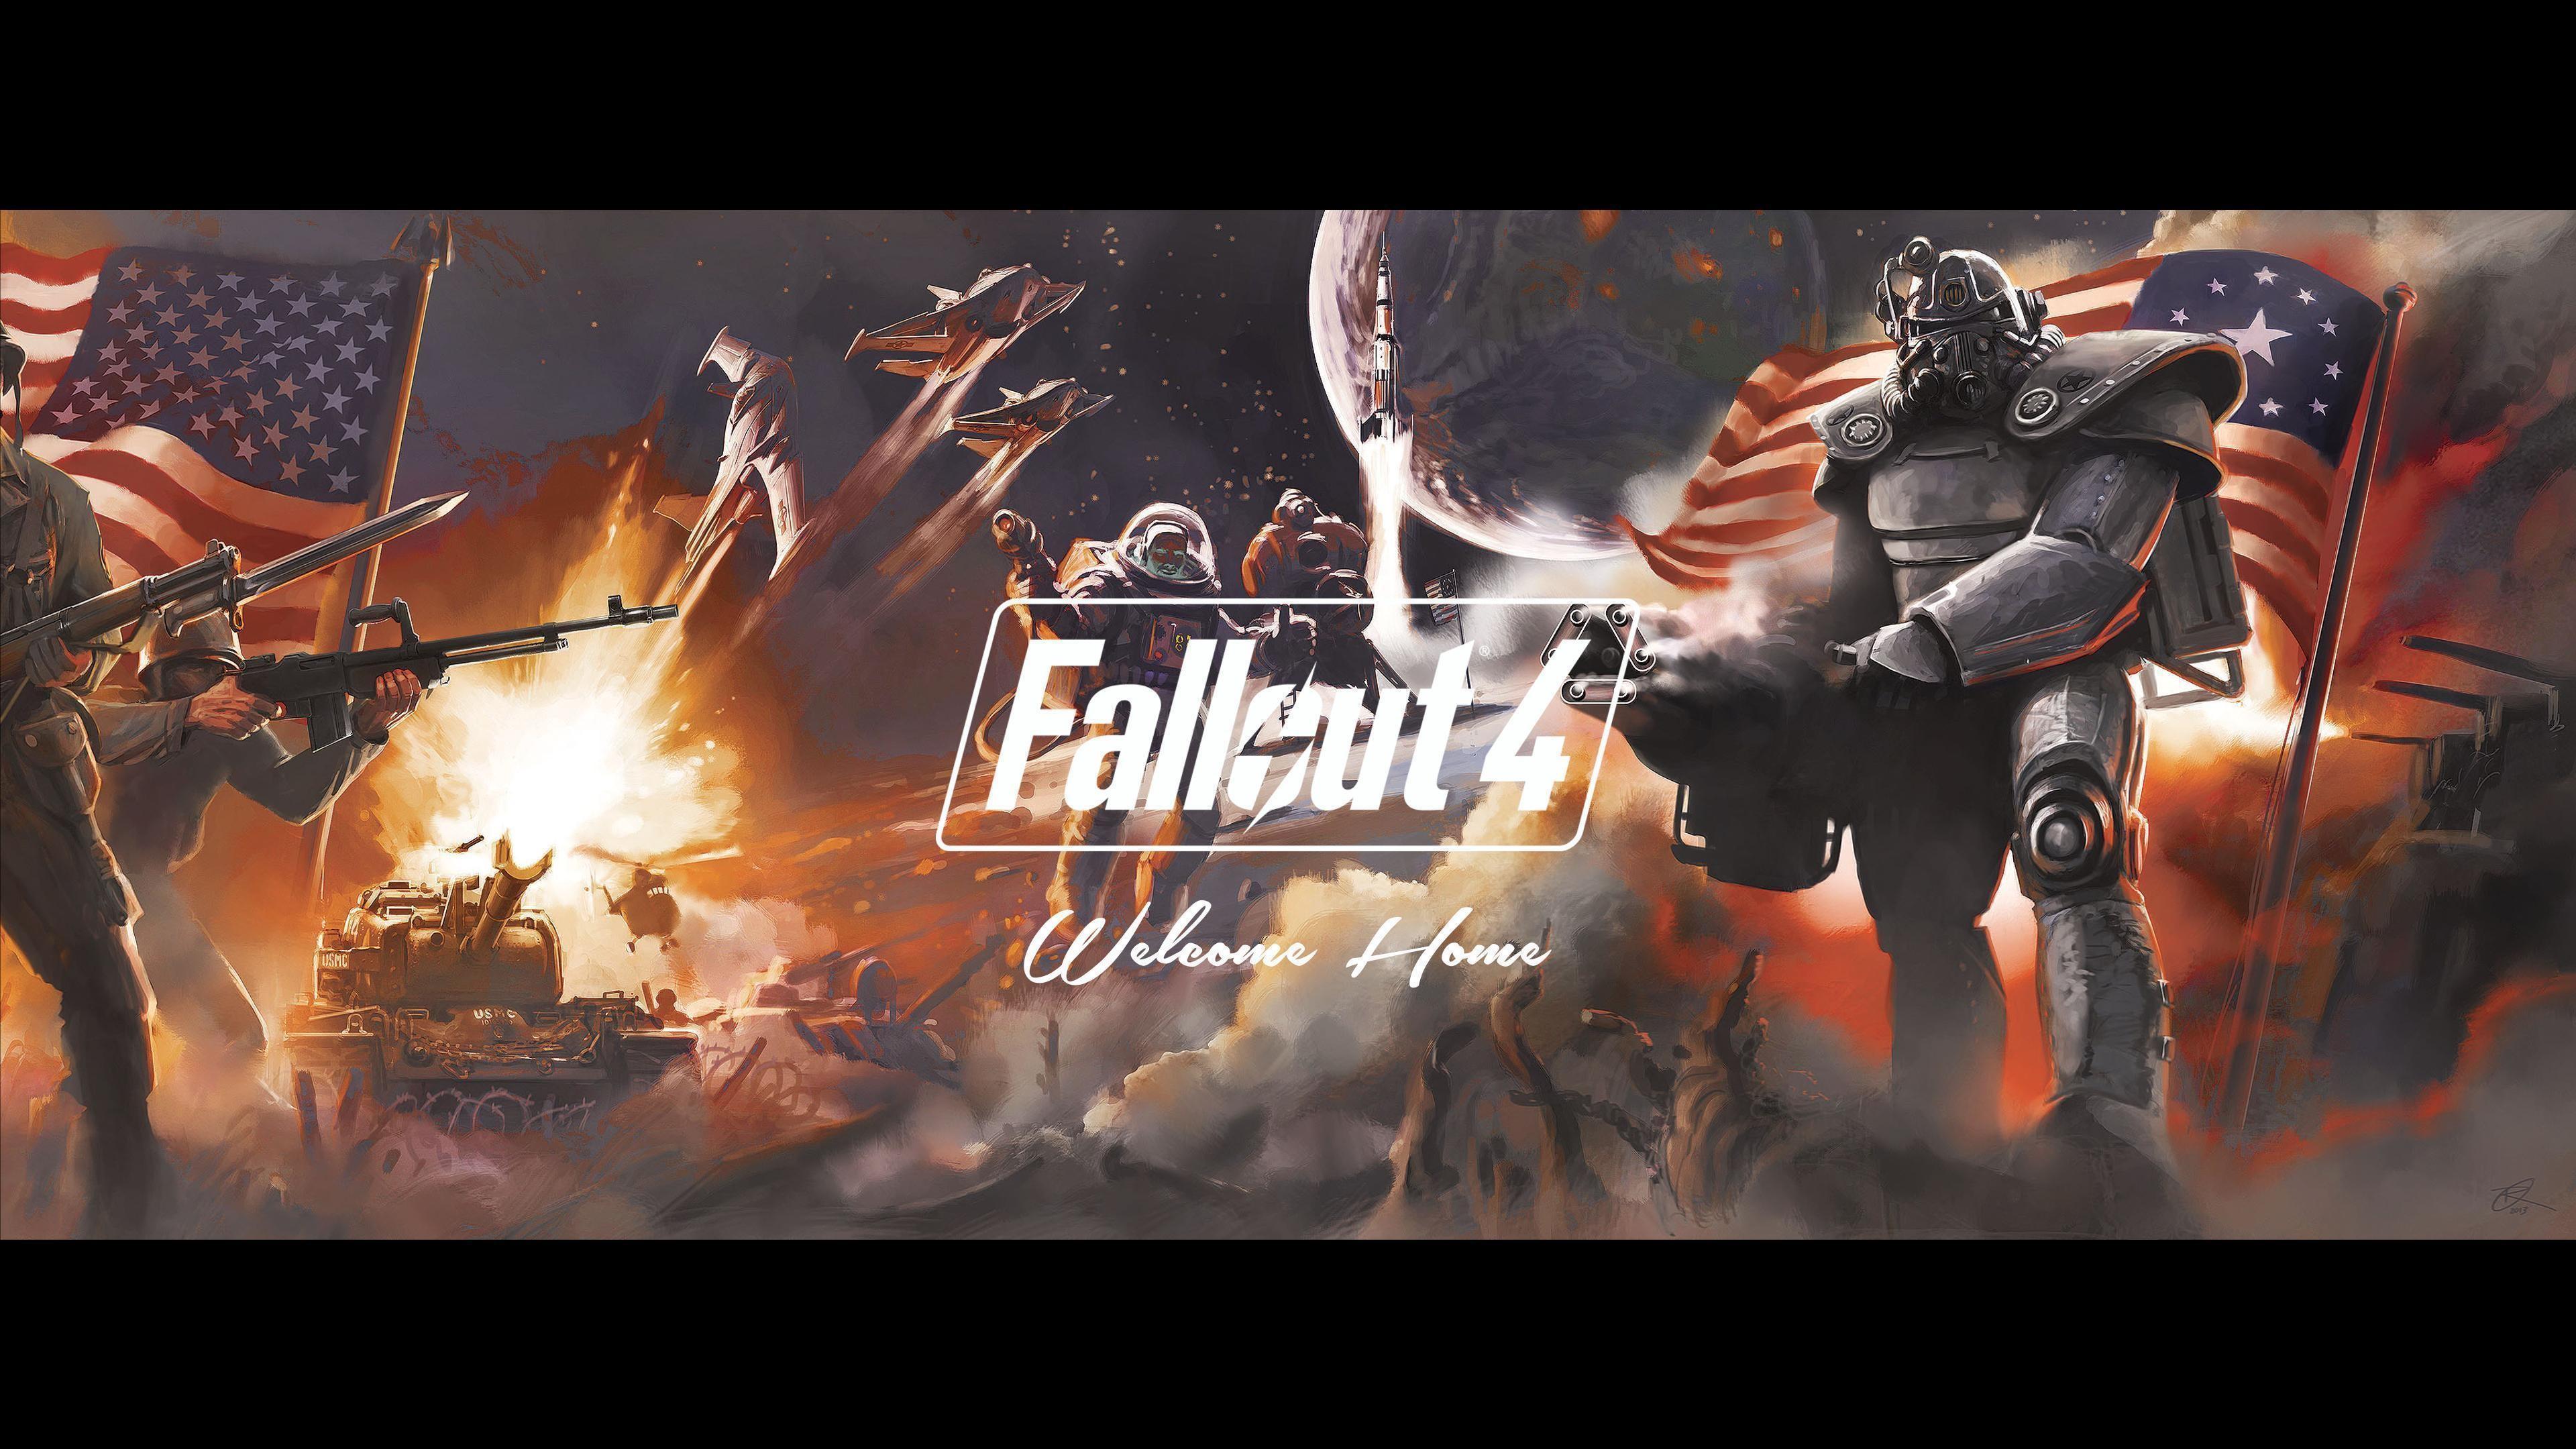 Fallout 4 Dual Monitor Wallpaper – WallpaperSafari